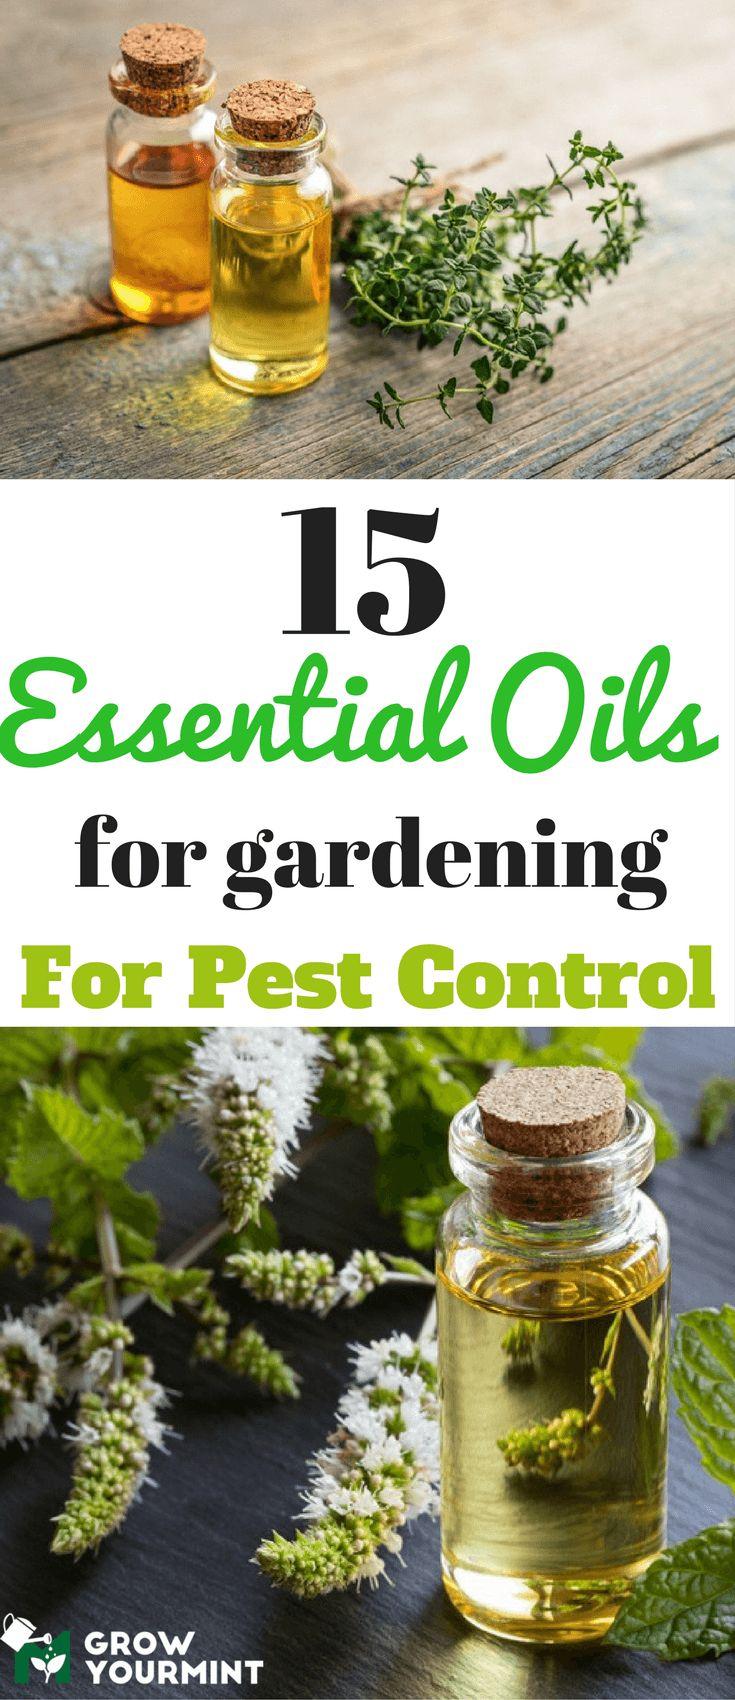 15 essential oils for gardening for gardening for pest control  #gardens#pest#growyourmint